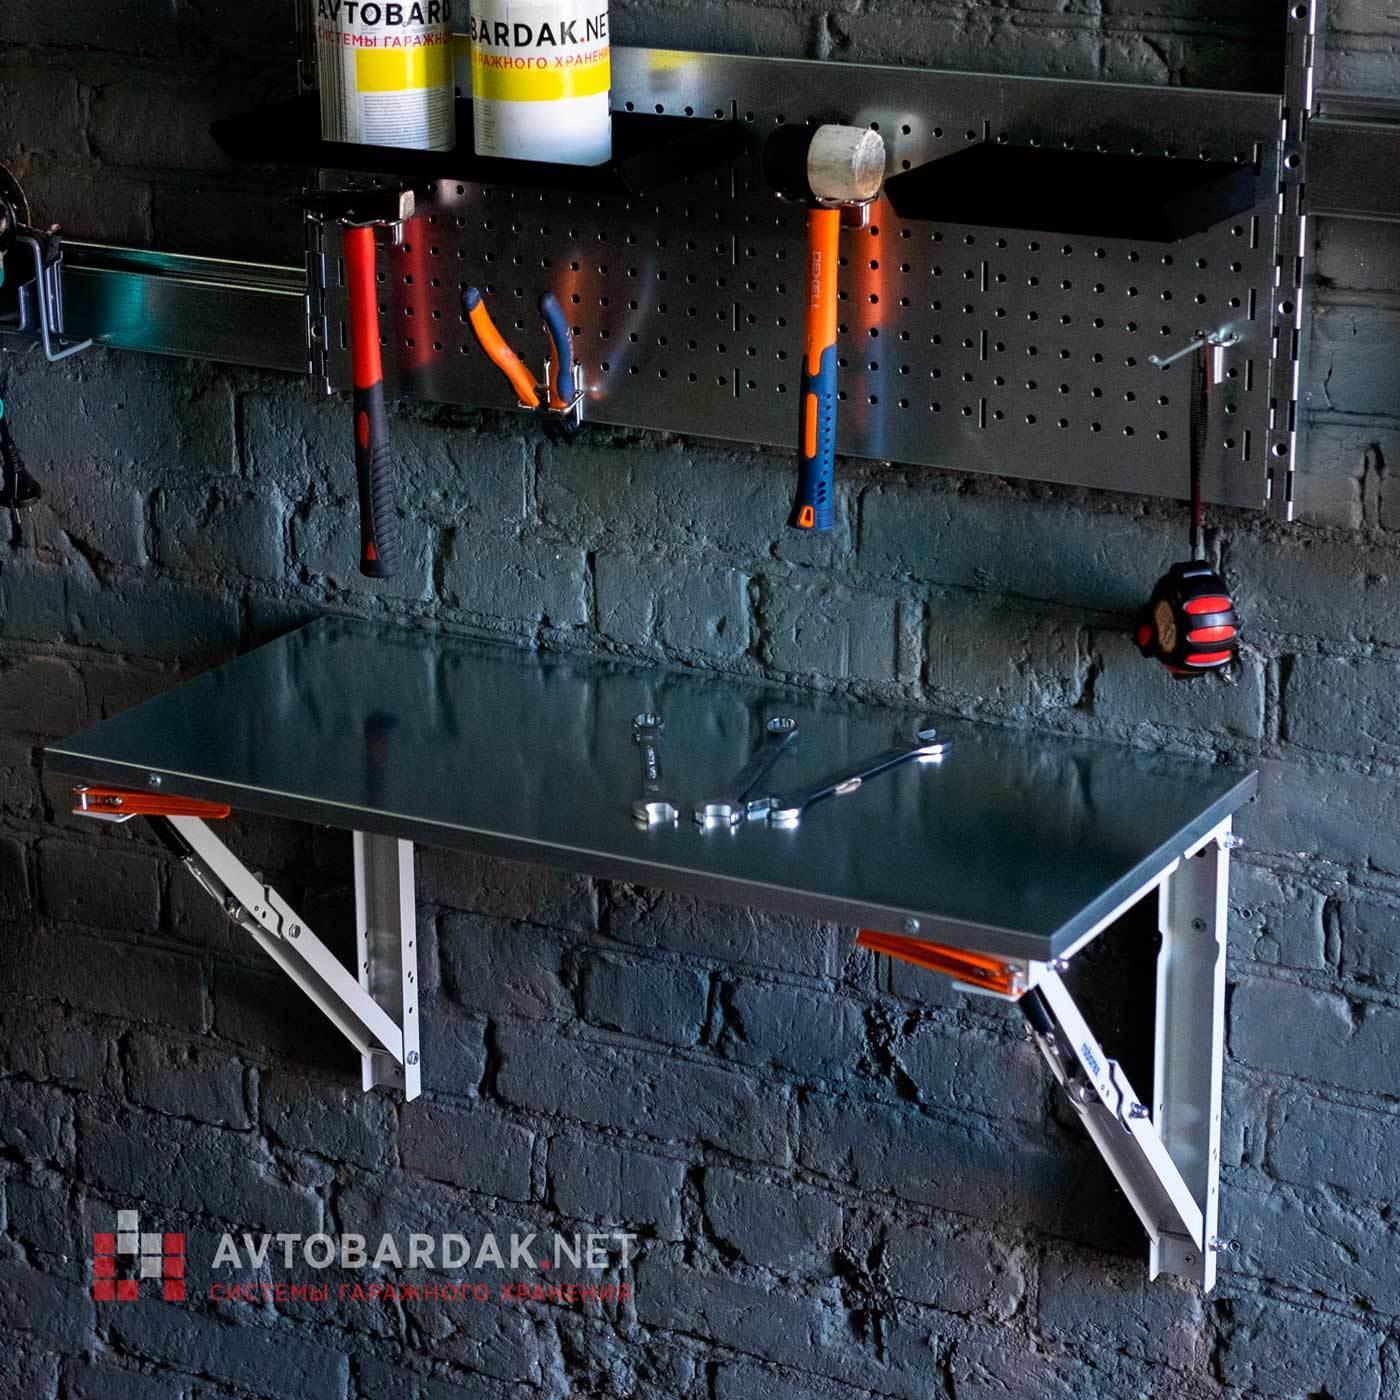 Кронштейны для откидного стола. Глубина 400—600 мм. Нагрузка 200 кг.